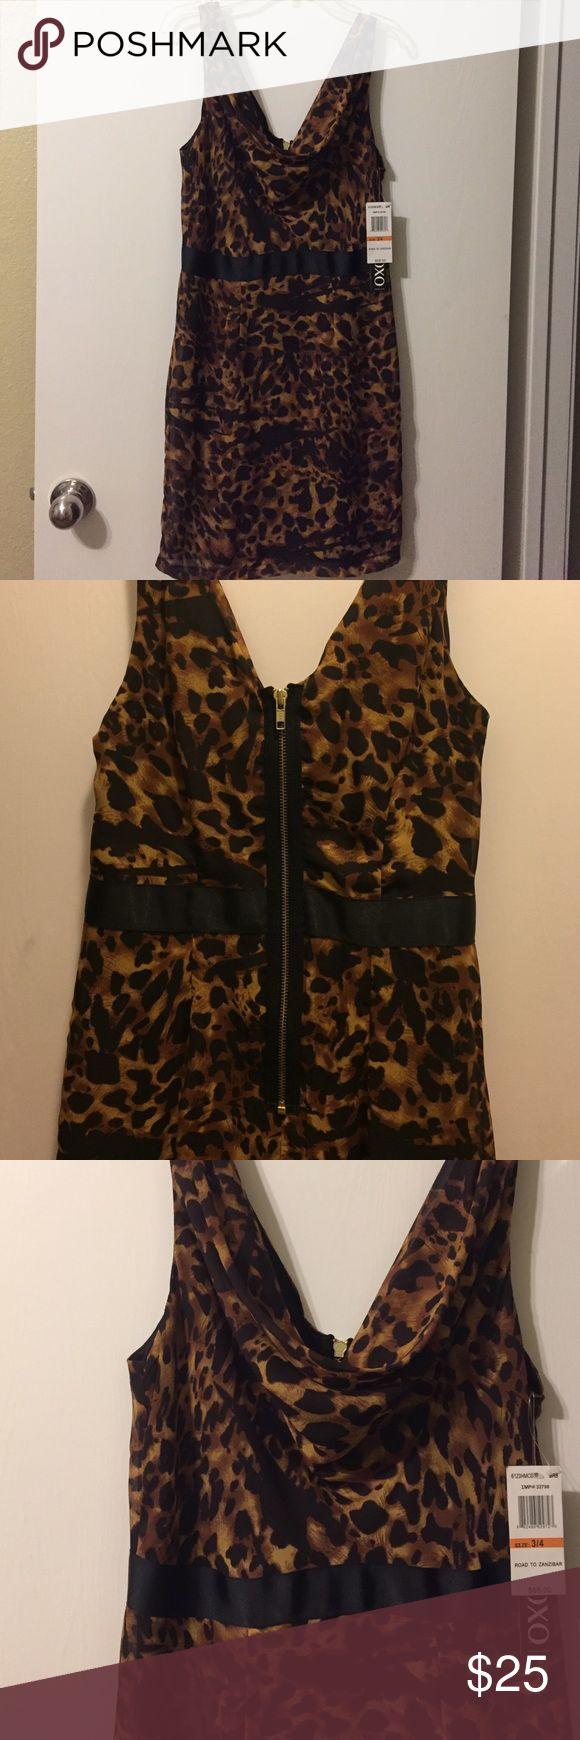 New XOXO Dress Brown cheetah dress with a metal zipper. XOXO Dresses Mini